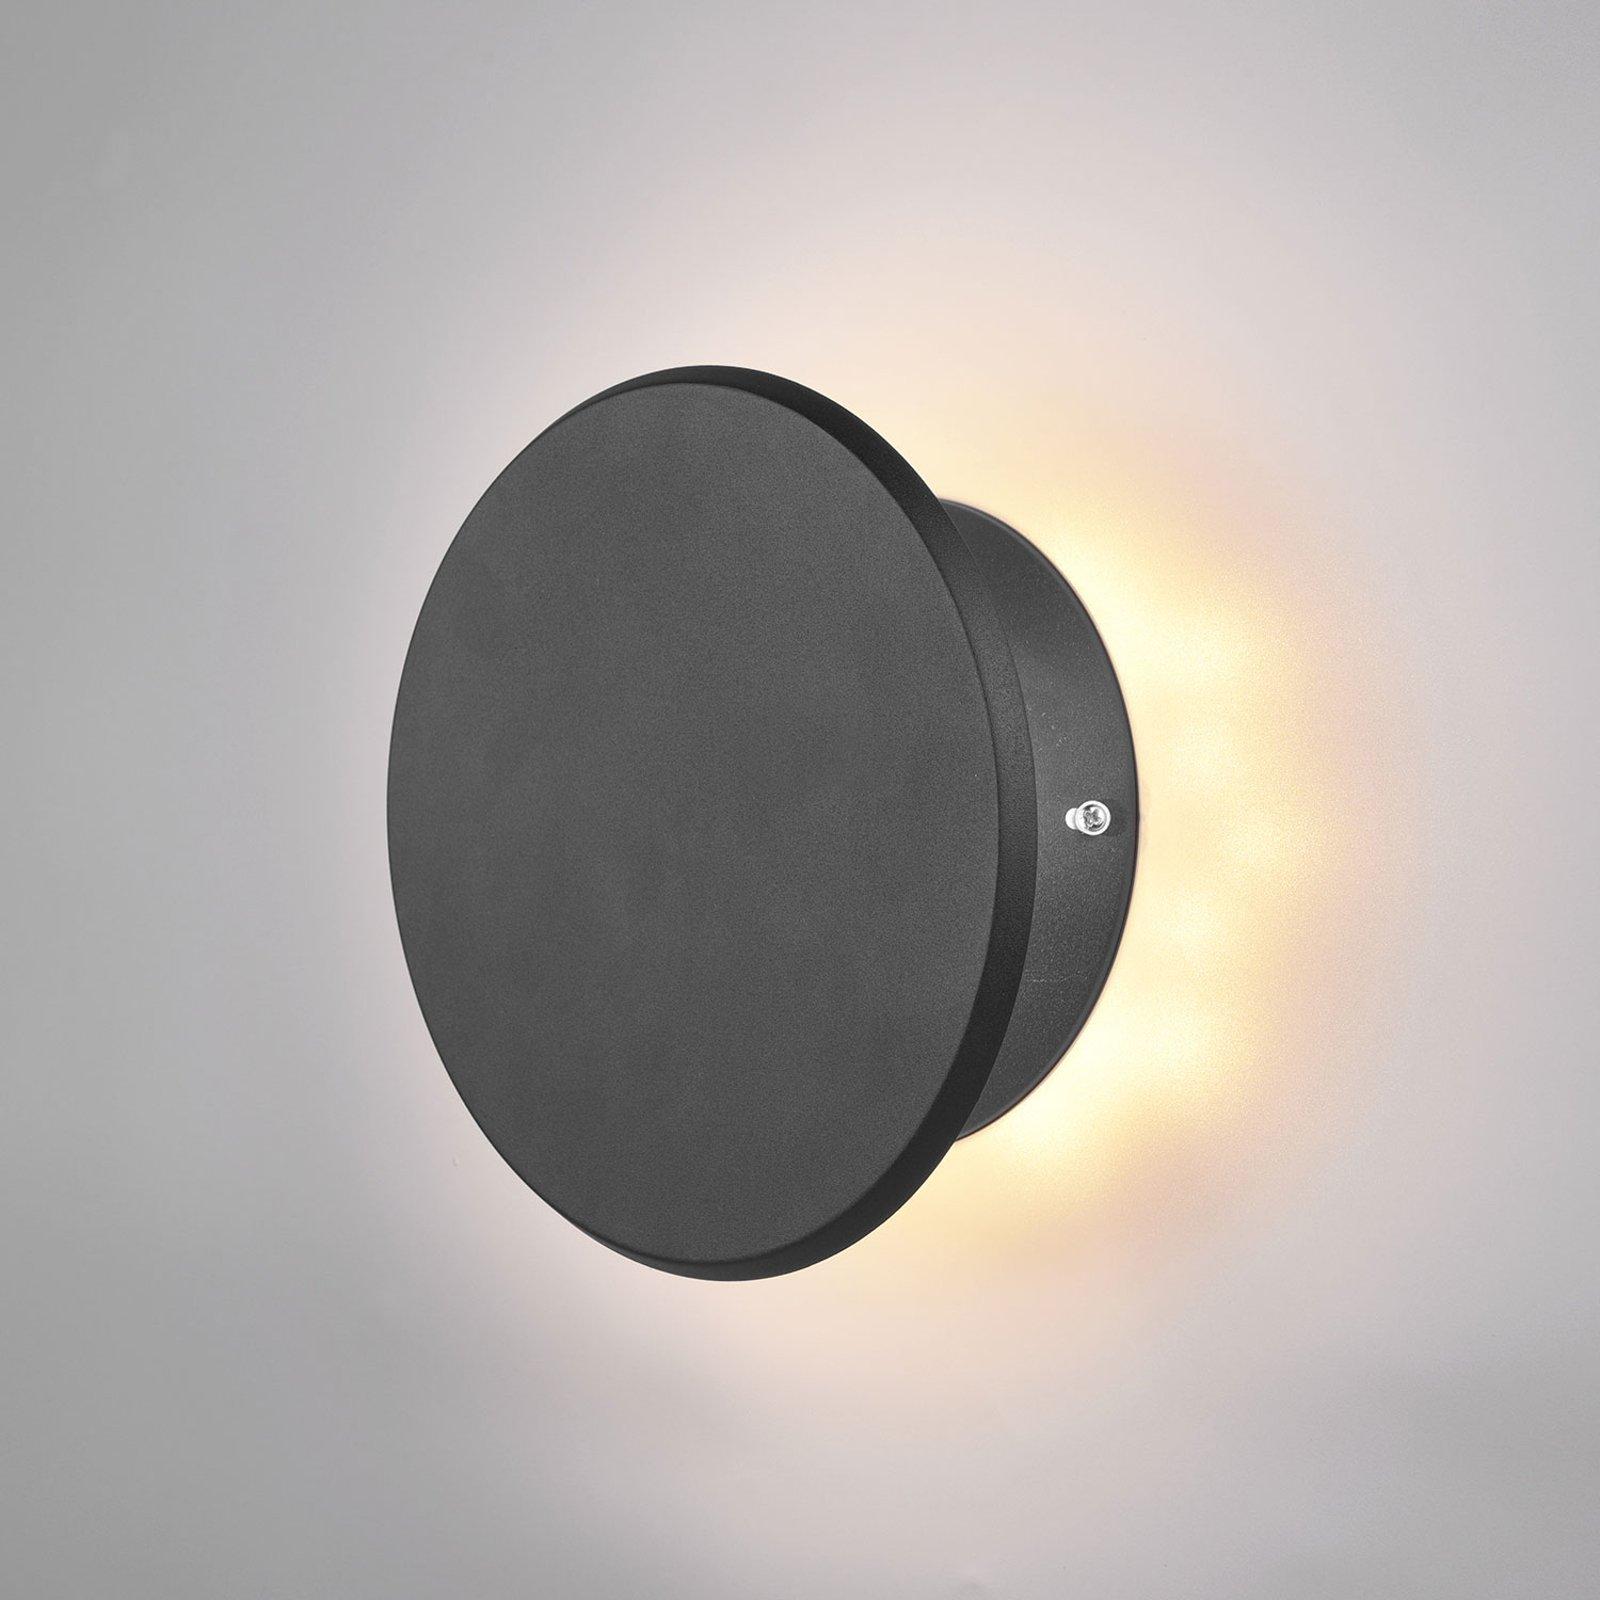 LED-vegglampe Gaston, svingbar, svart